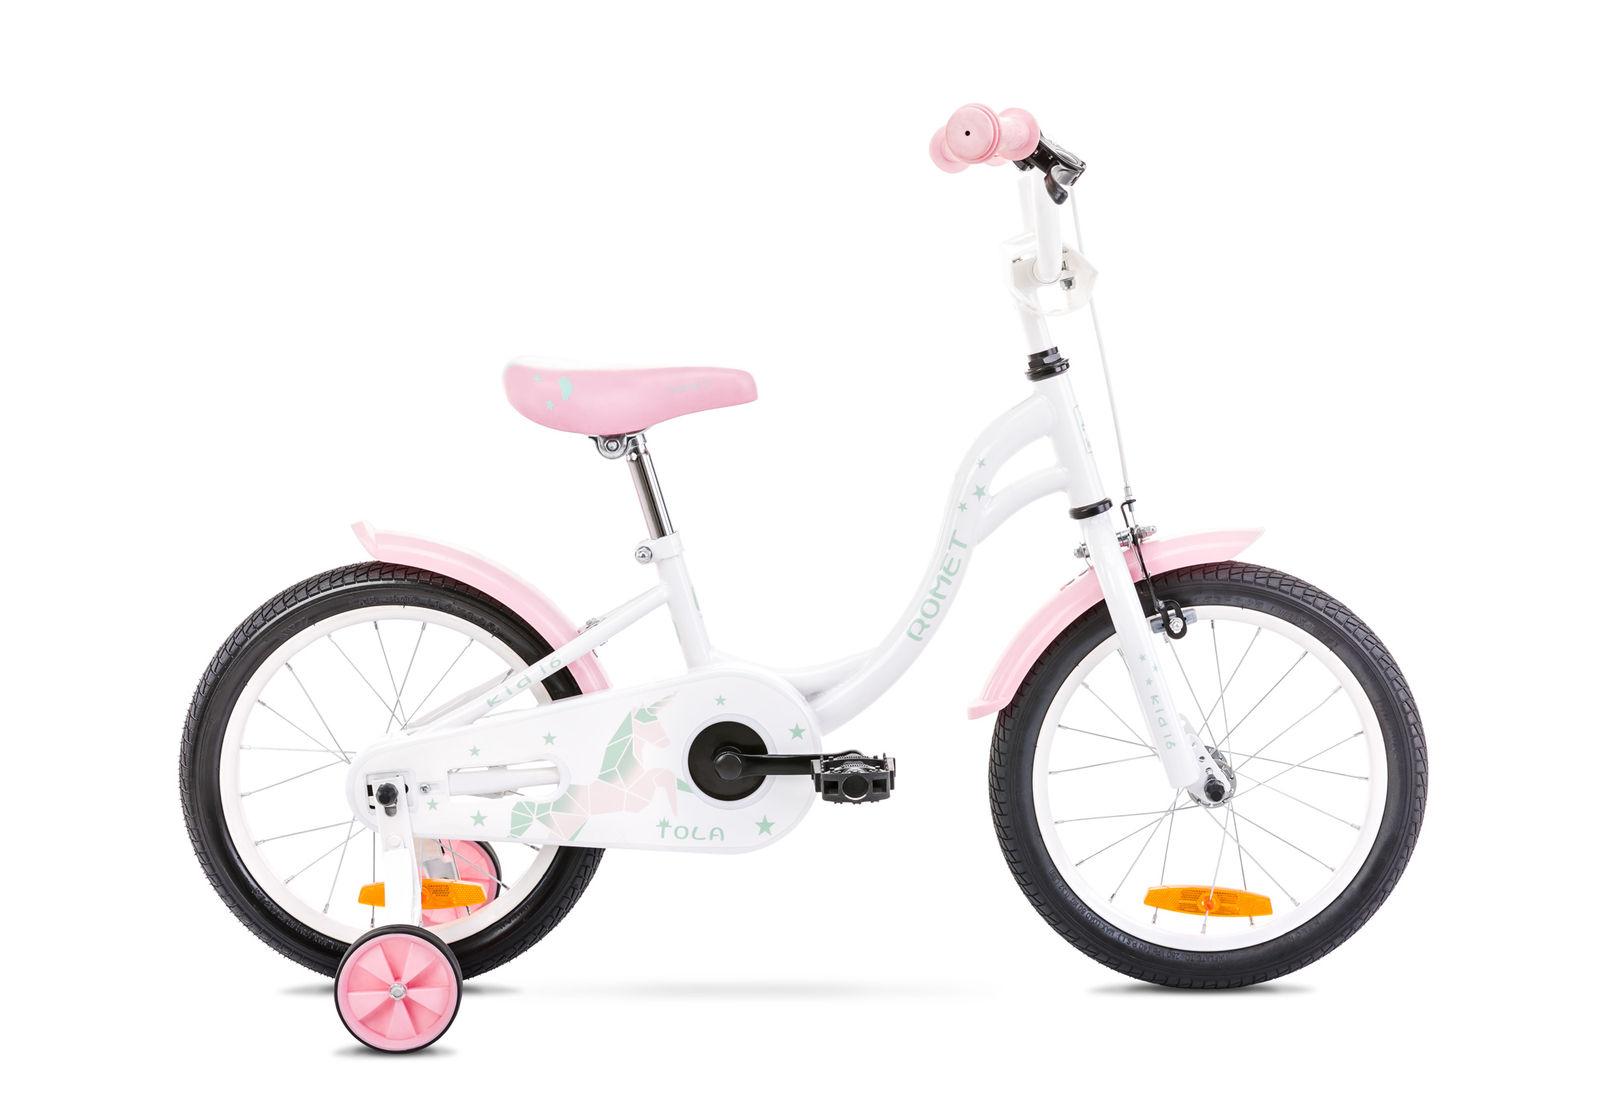 Bicicleta pentru copii Romet Tola 16 S/9 Alb/Turcoaz 2021 imagine